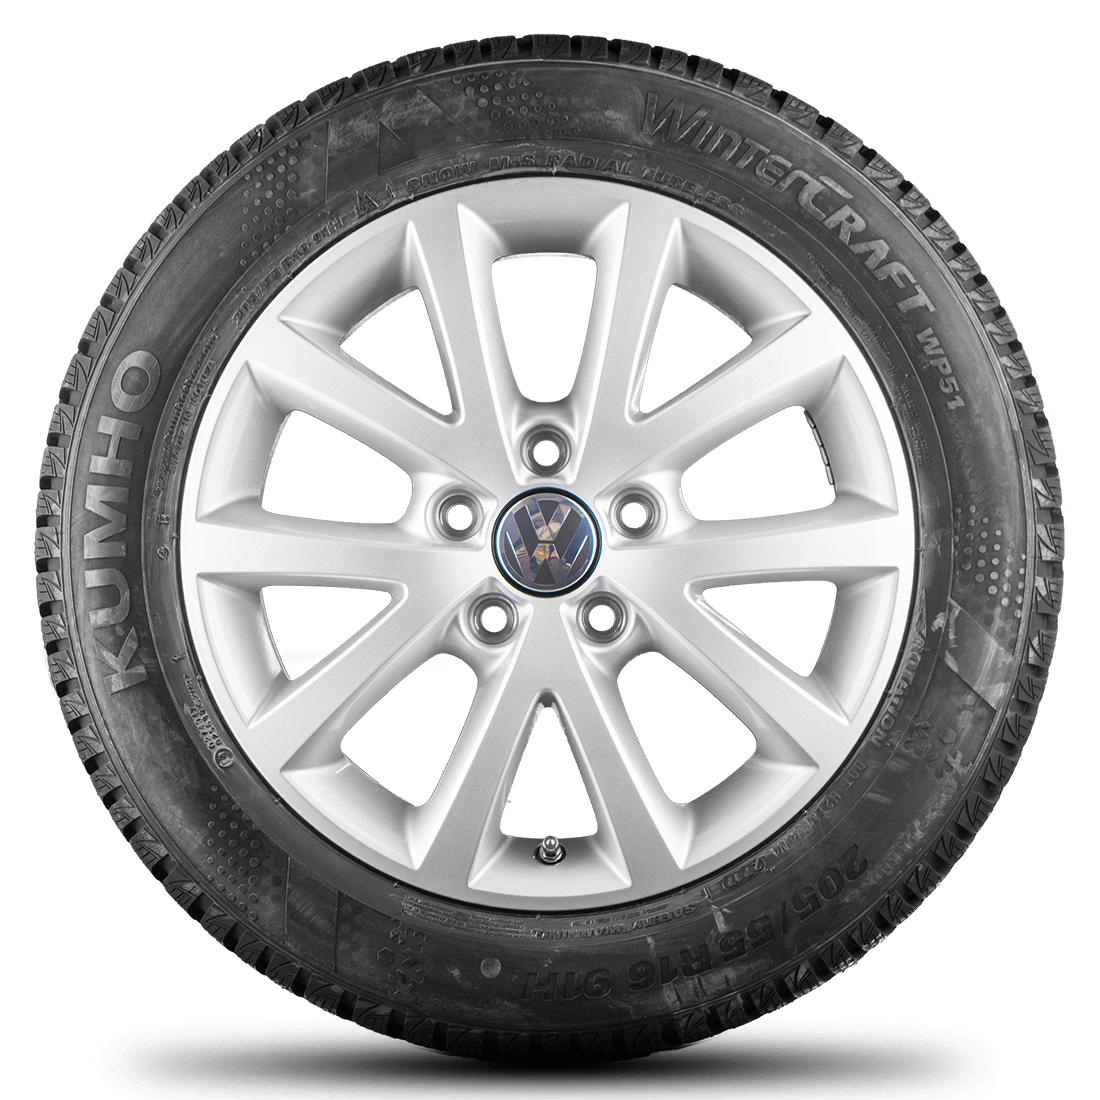 VW 16 Zoll Felgen Golf 5 6 Jetta Touran Sedona Winterräder Winterreifen NEU